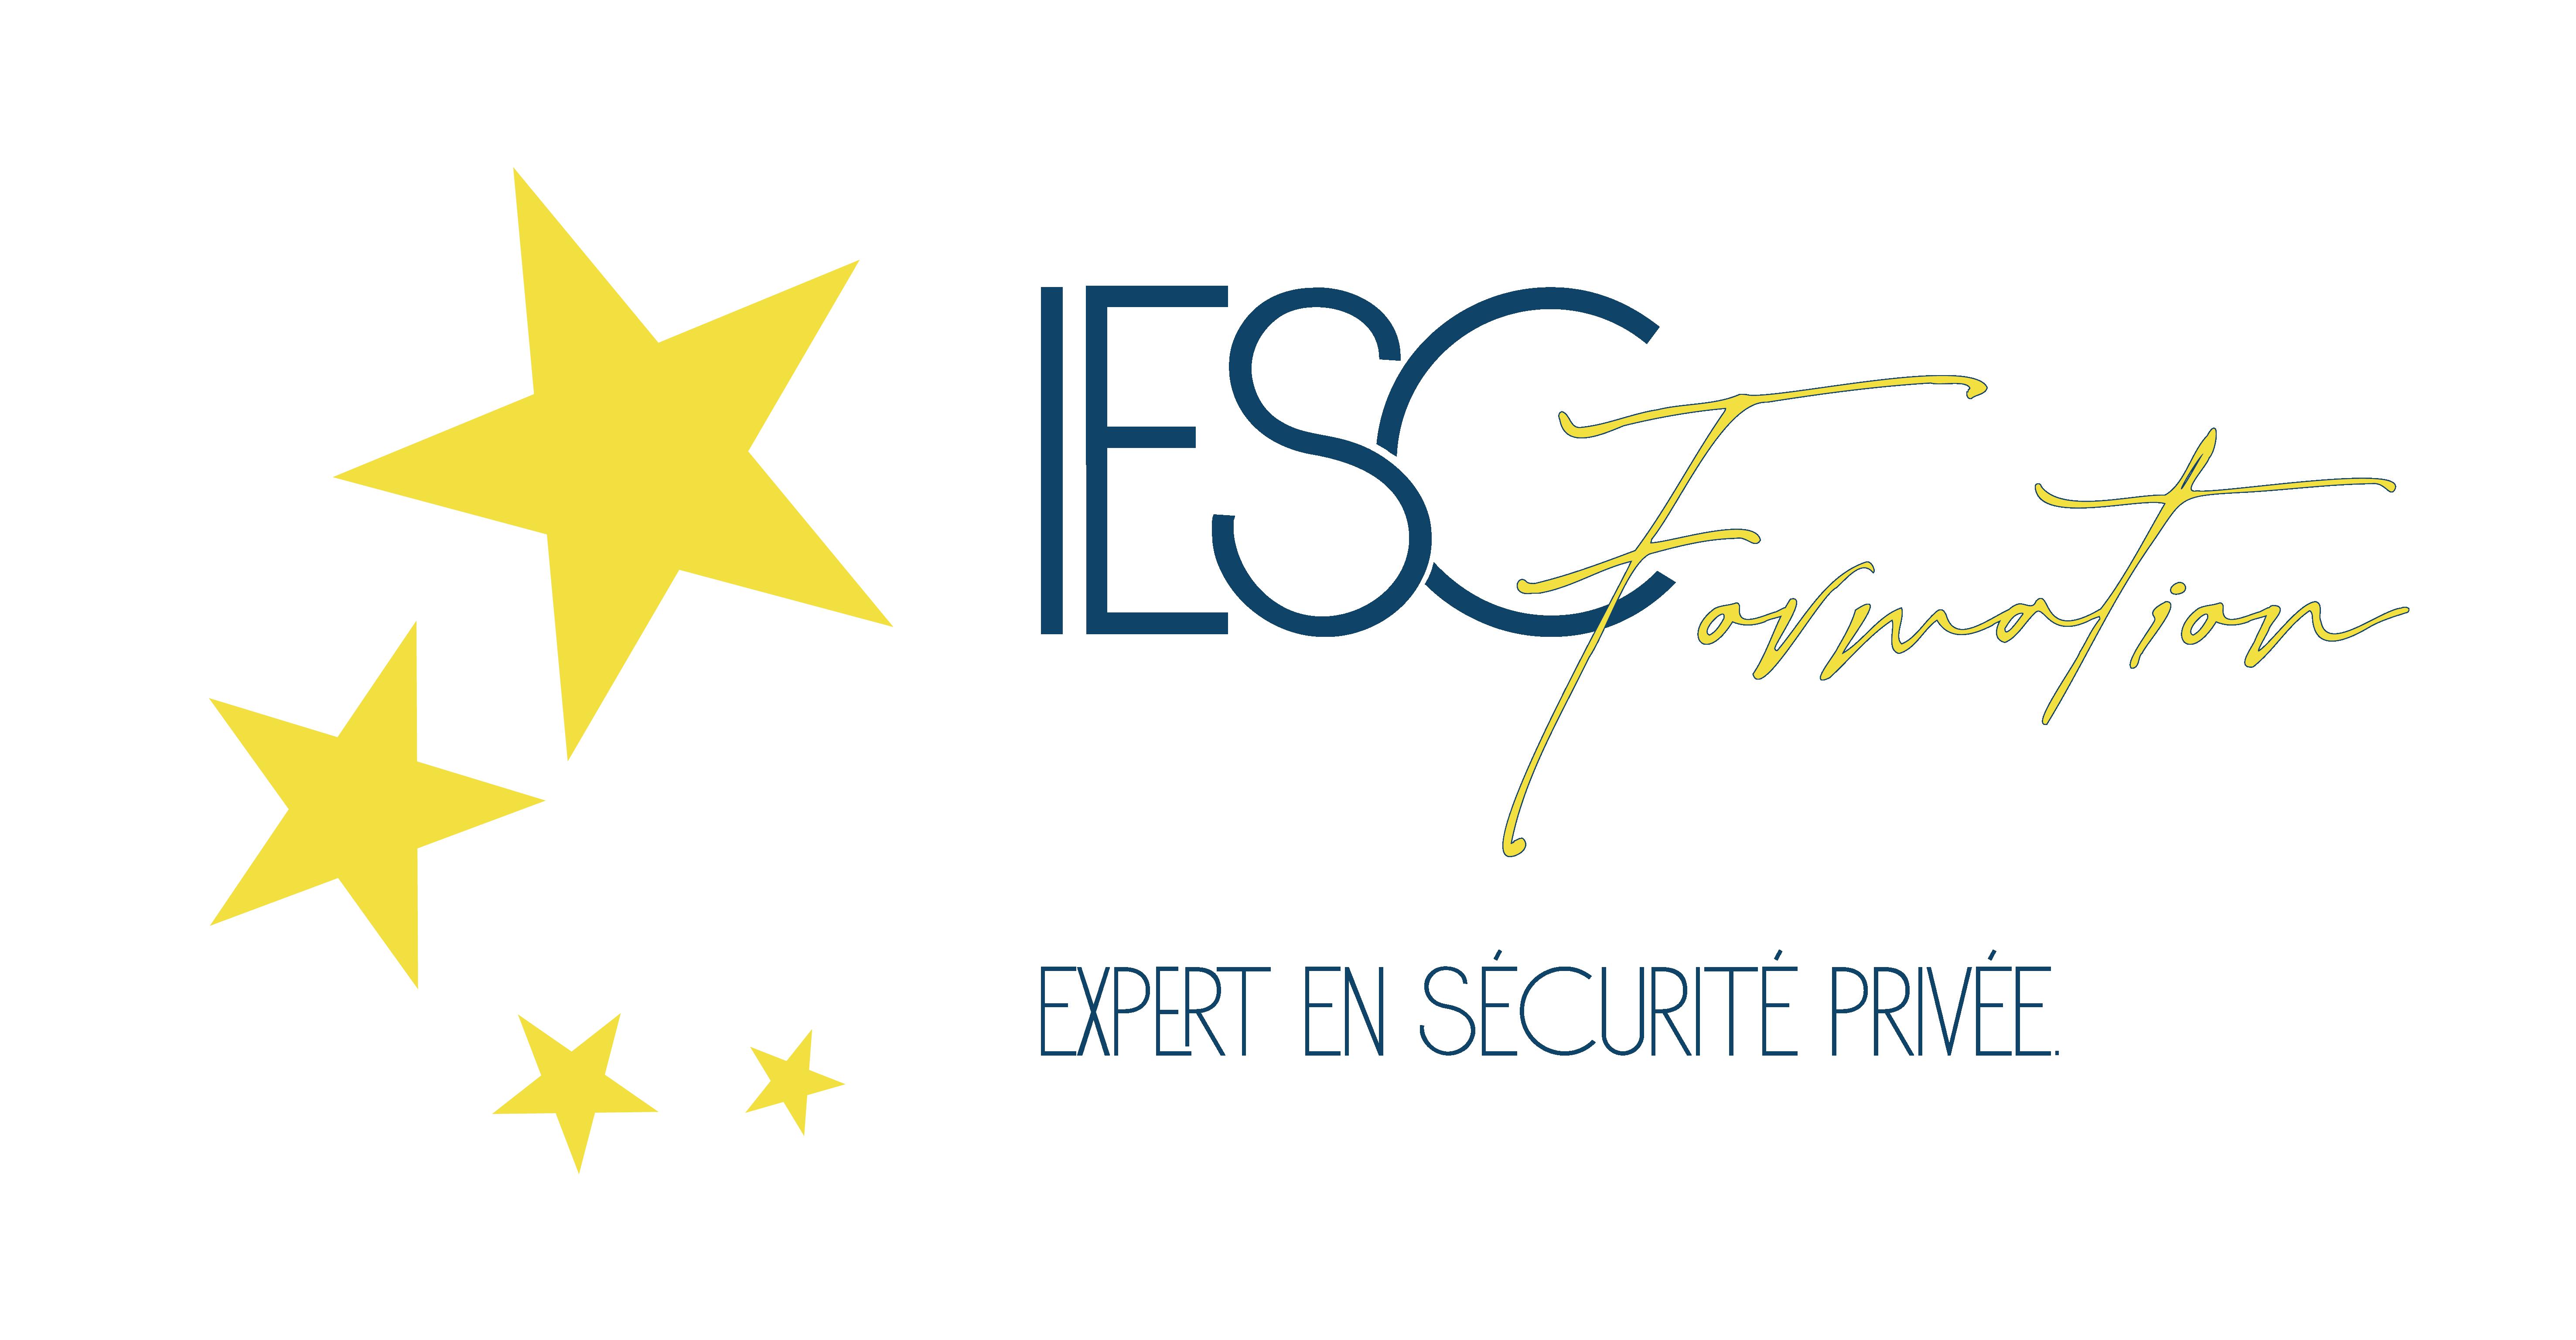 IESC Formation